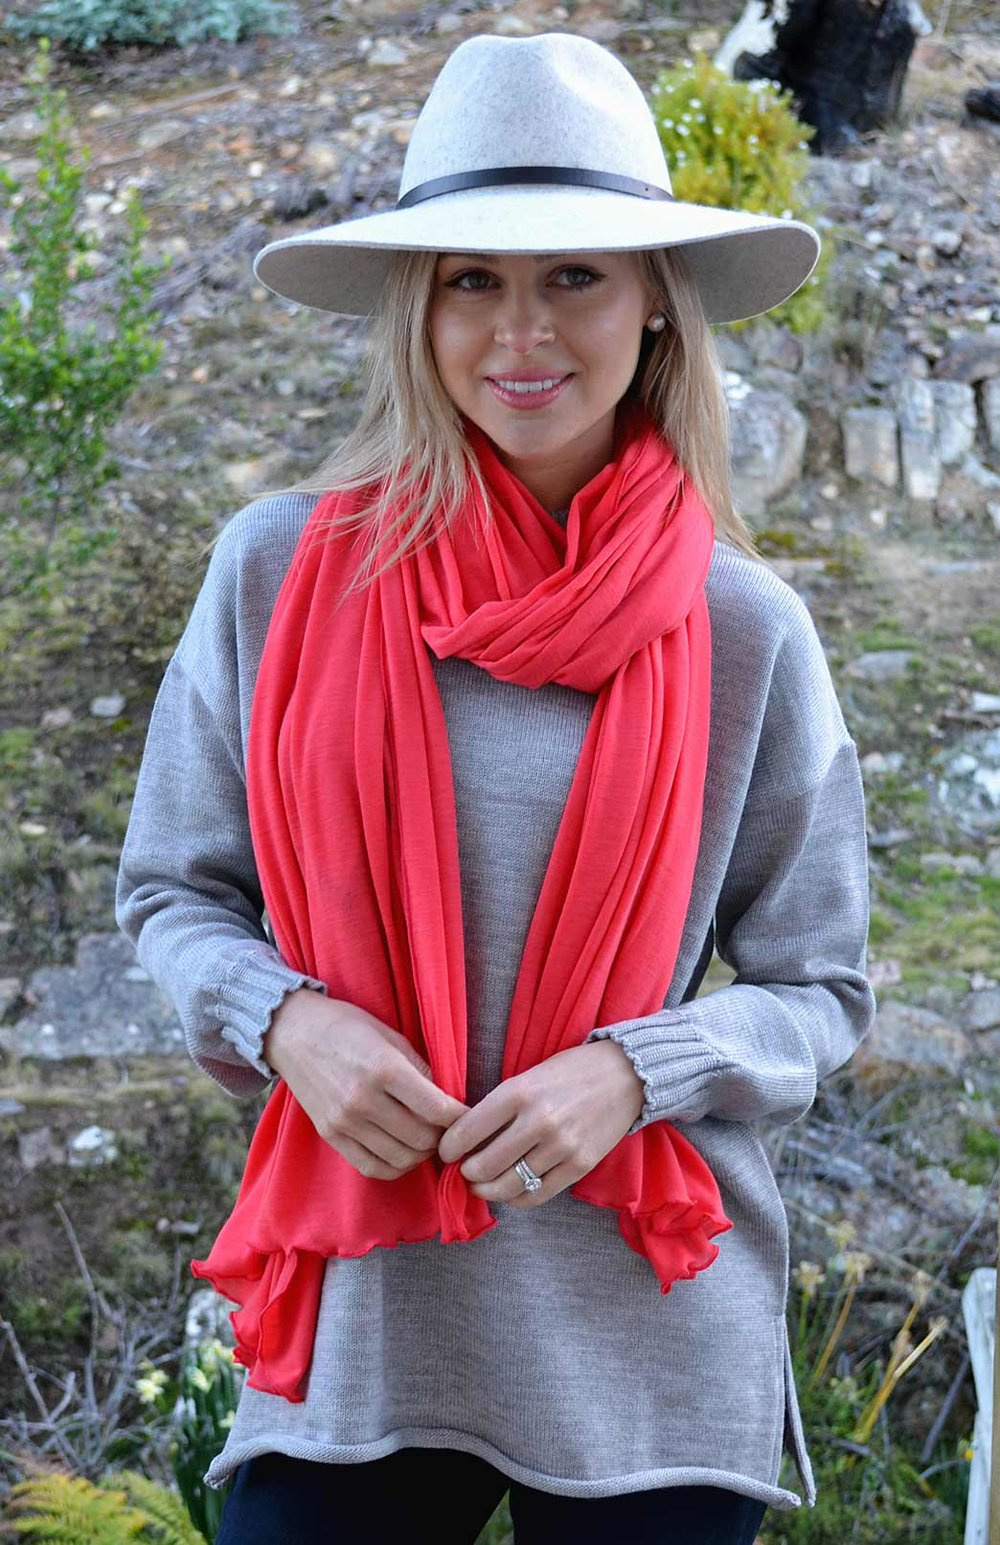 8404-wide-merino-scarf-salmon-pink-04-hero.jpg